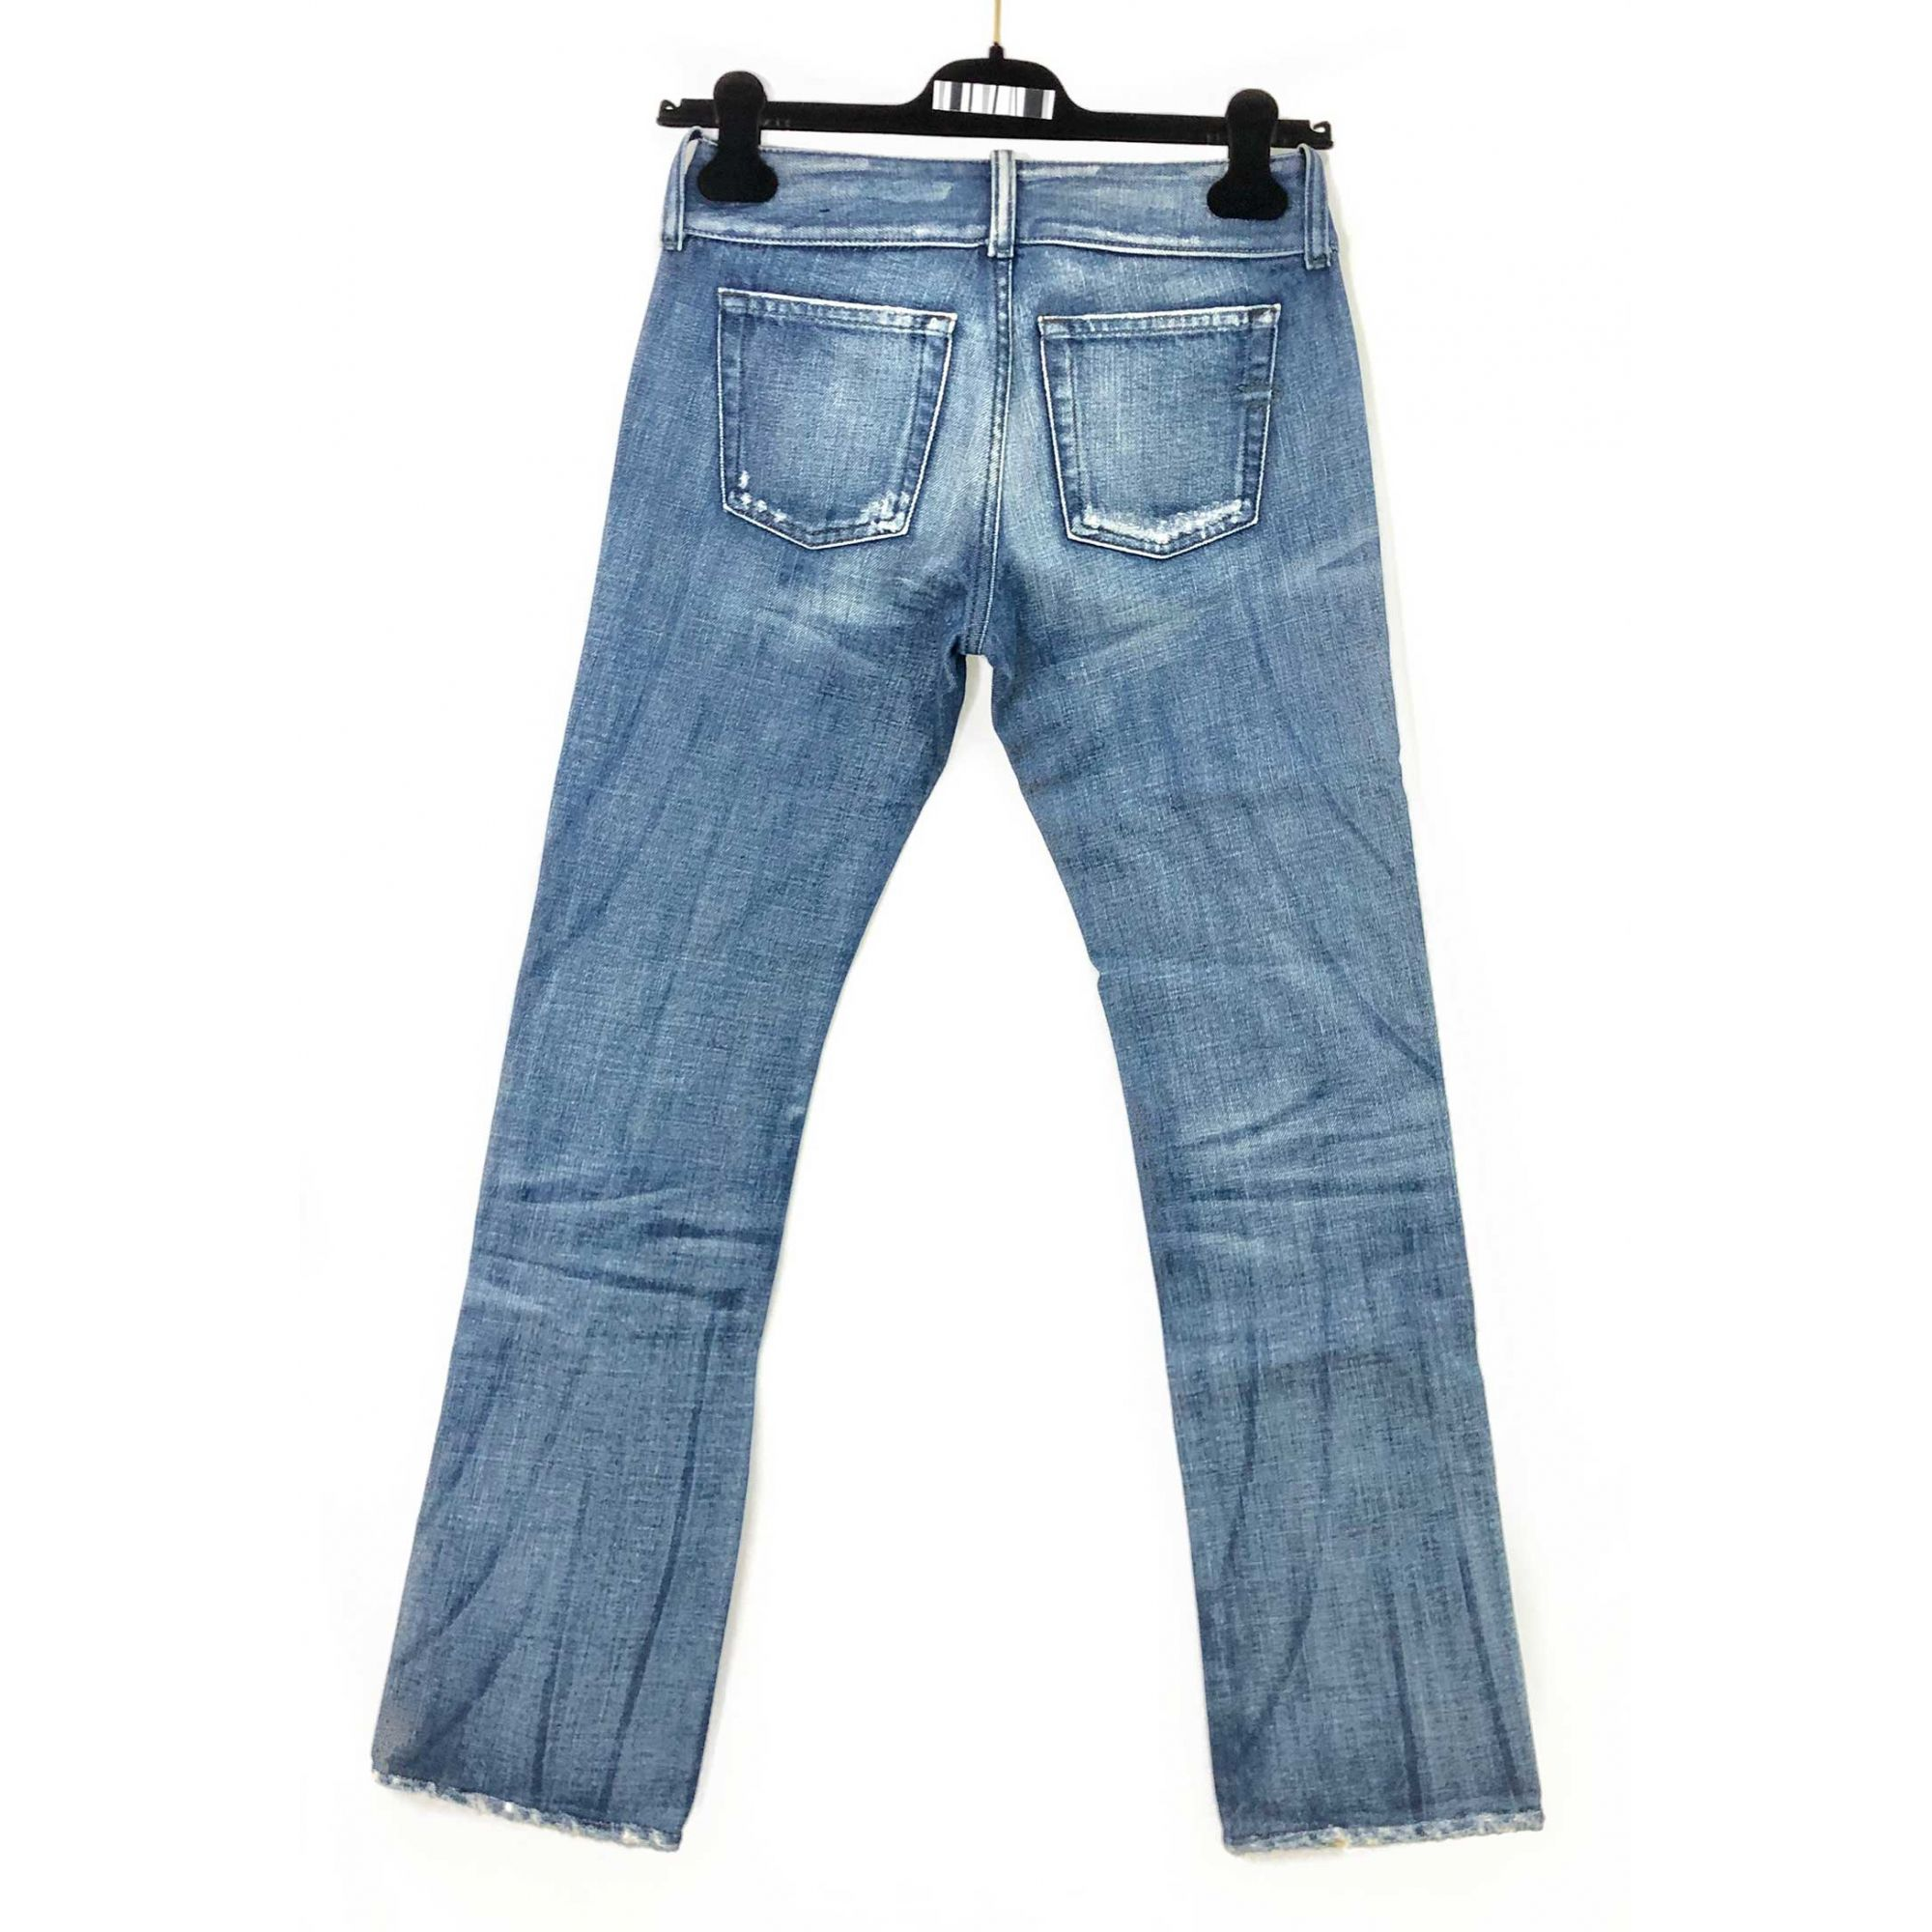 Calça Jeans Diesel Bootcut Tira Longa Cintura